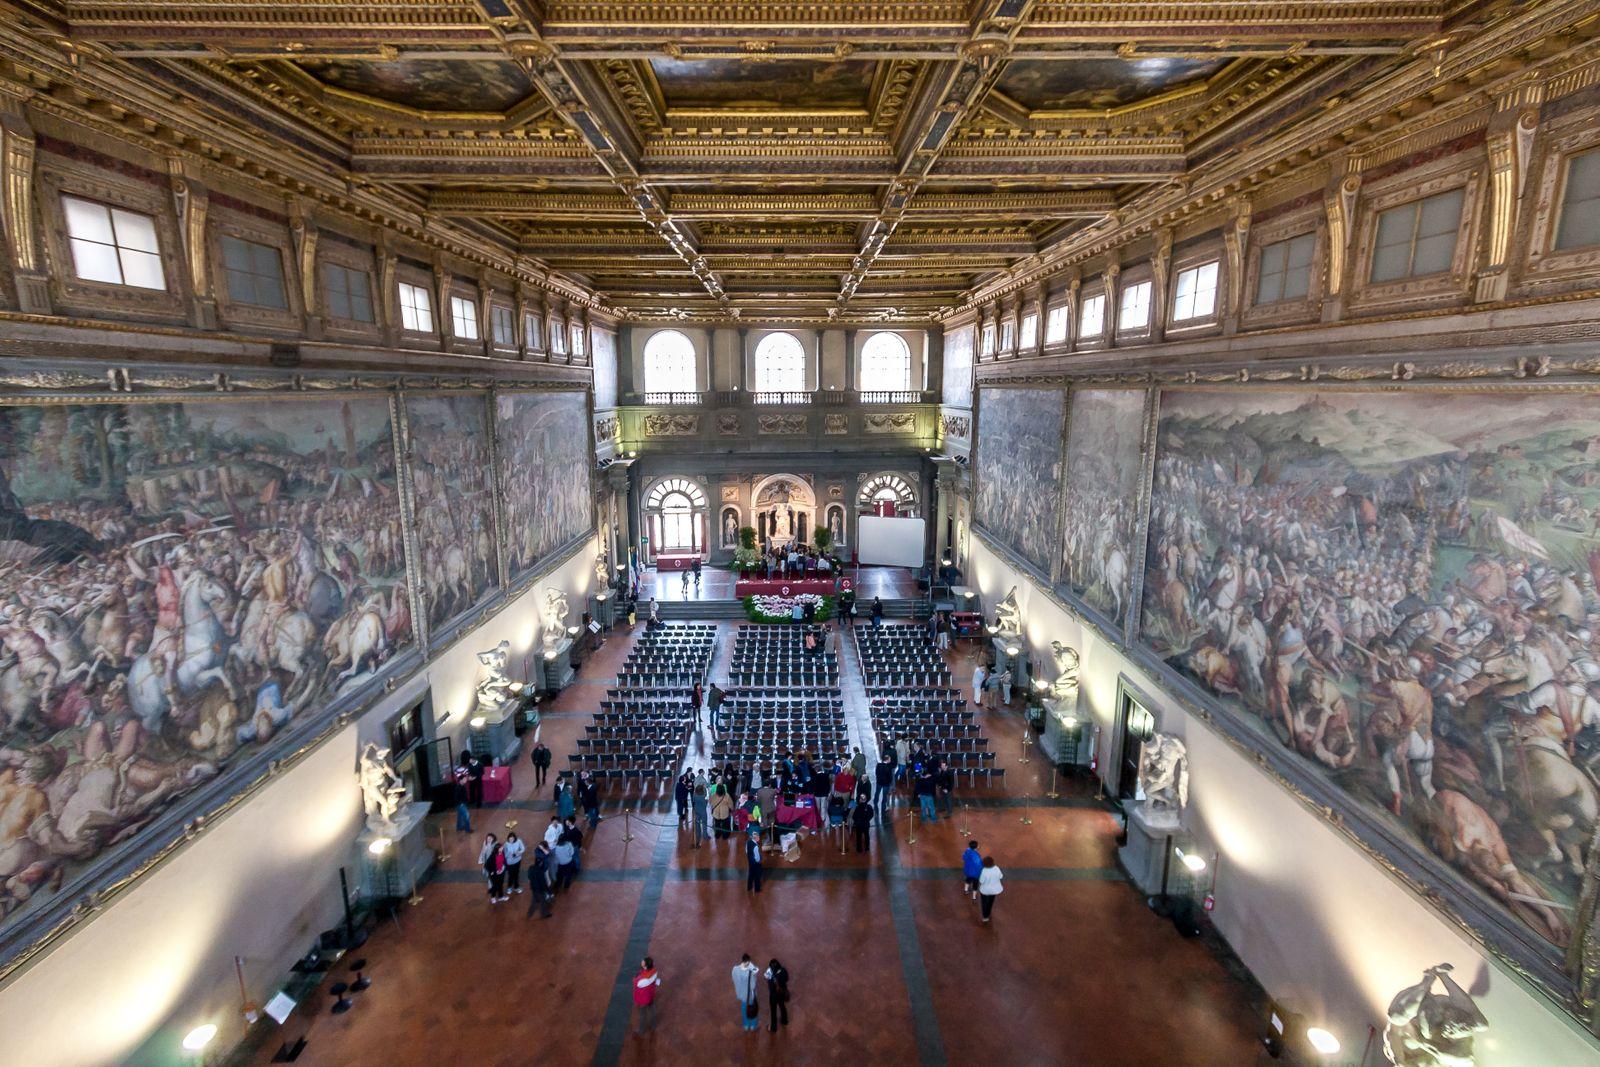 Ceiling of the Hall of the Five Hundred (Salone dei Cinquecento) in Palazzo Vecchio